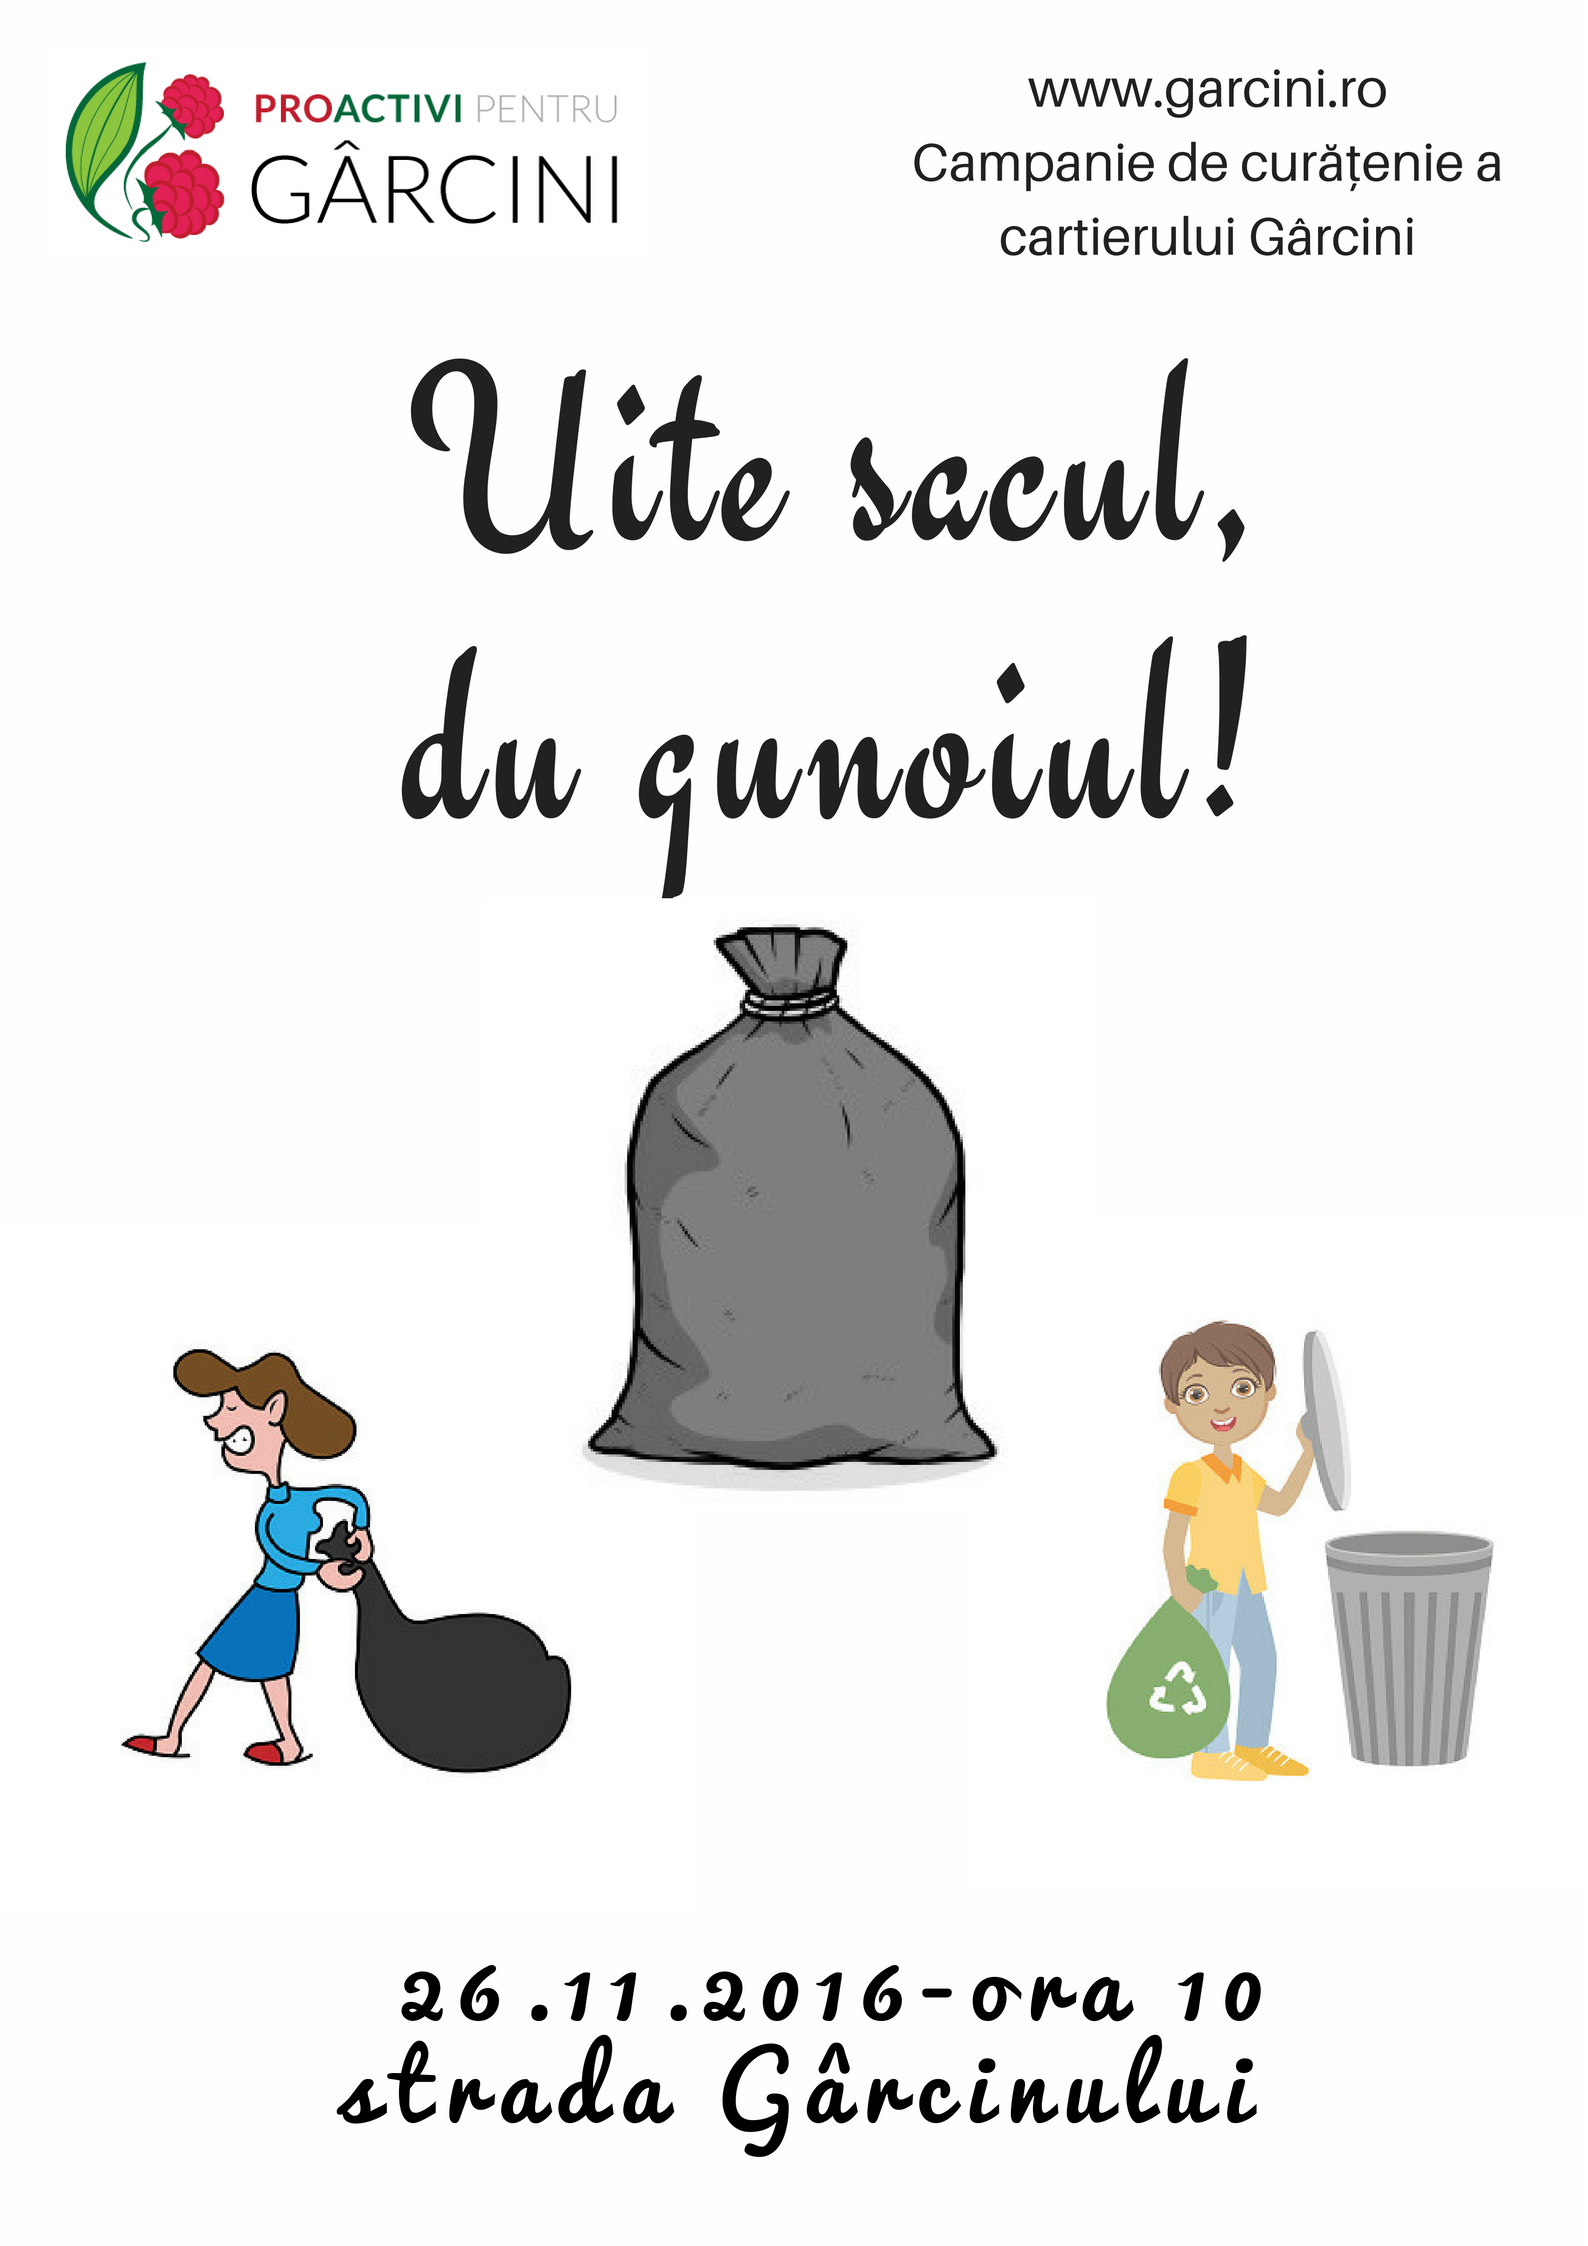 afis proactivi-du gunoiul